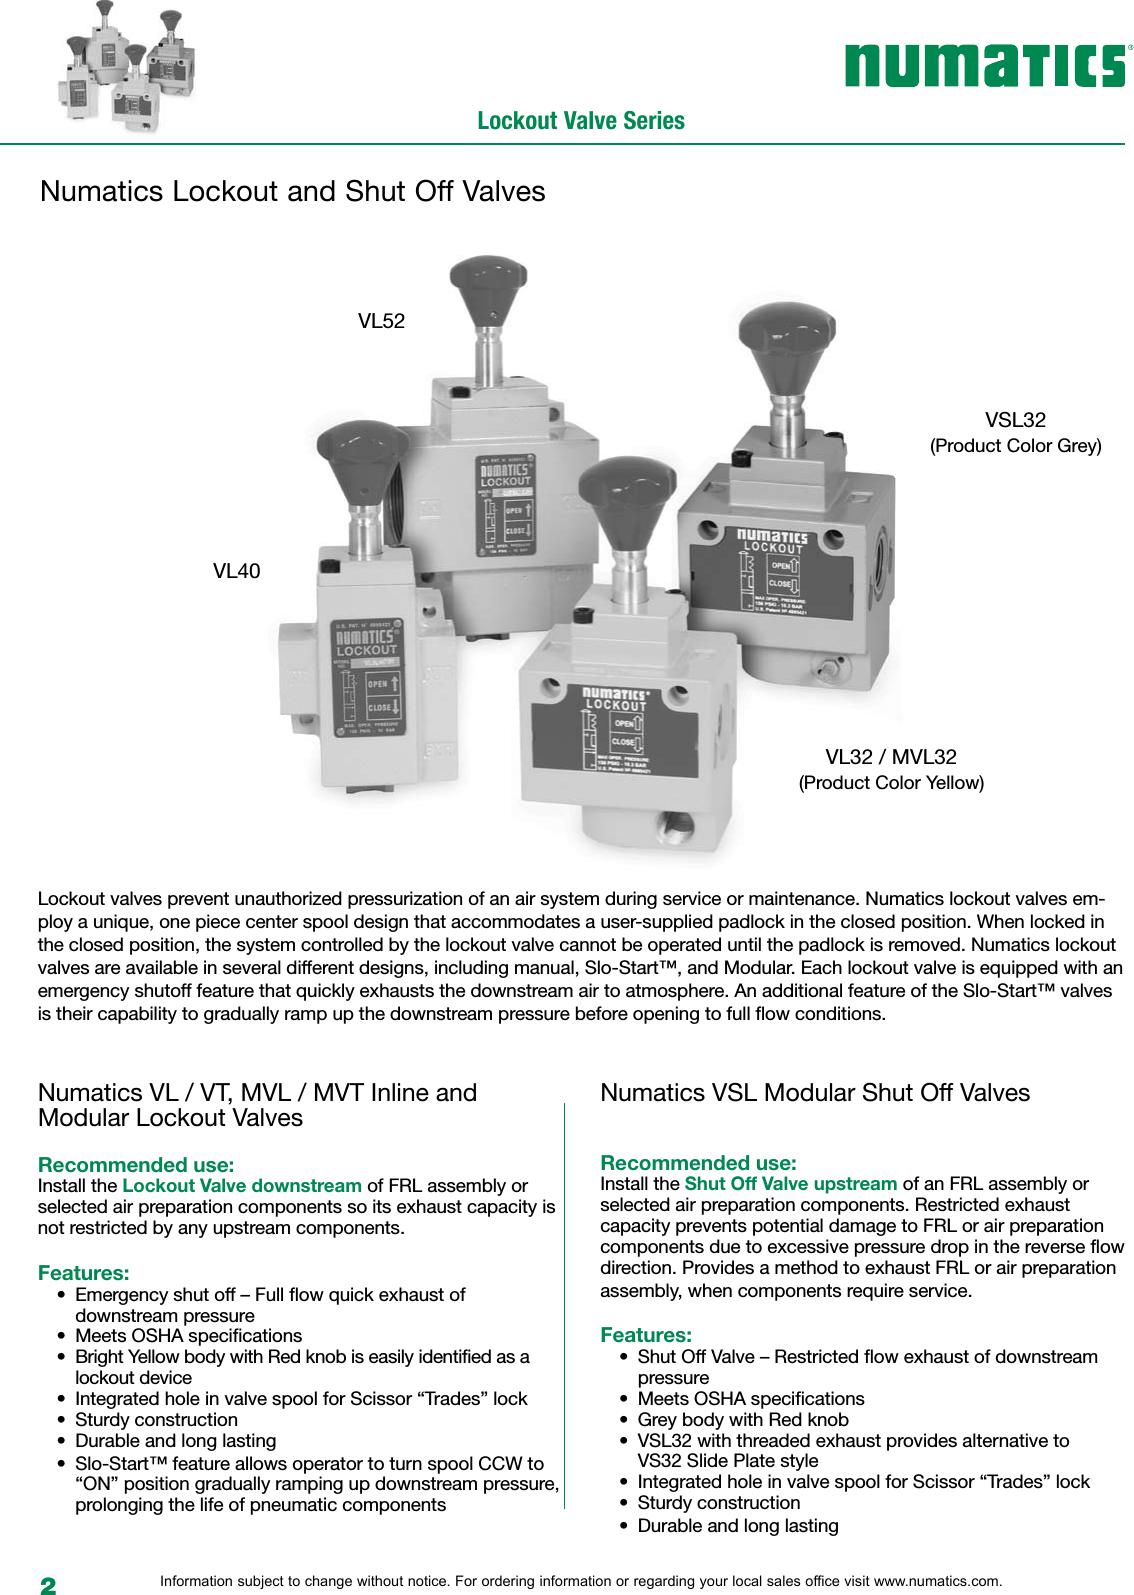 Flow Numatic Lockout Series 1505484633 User Manual